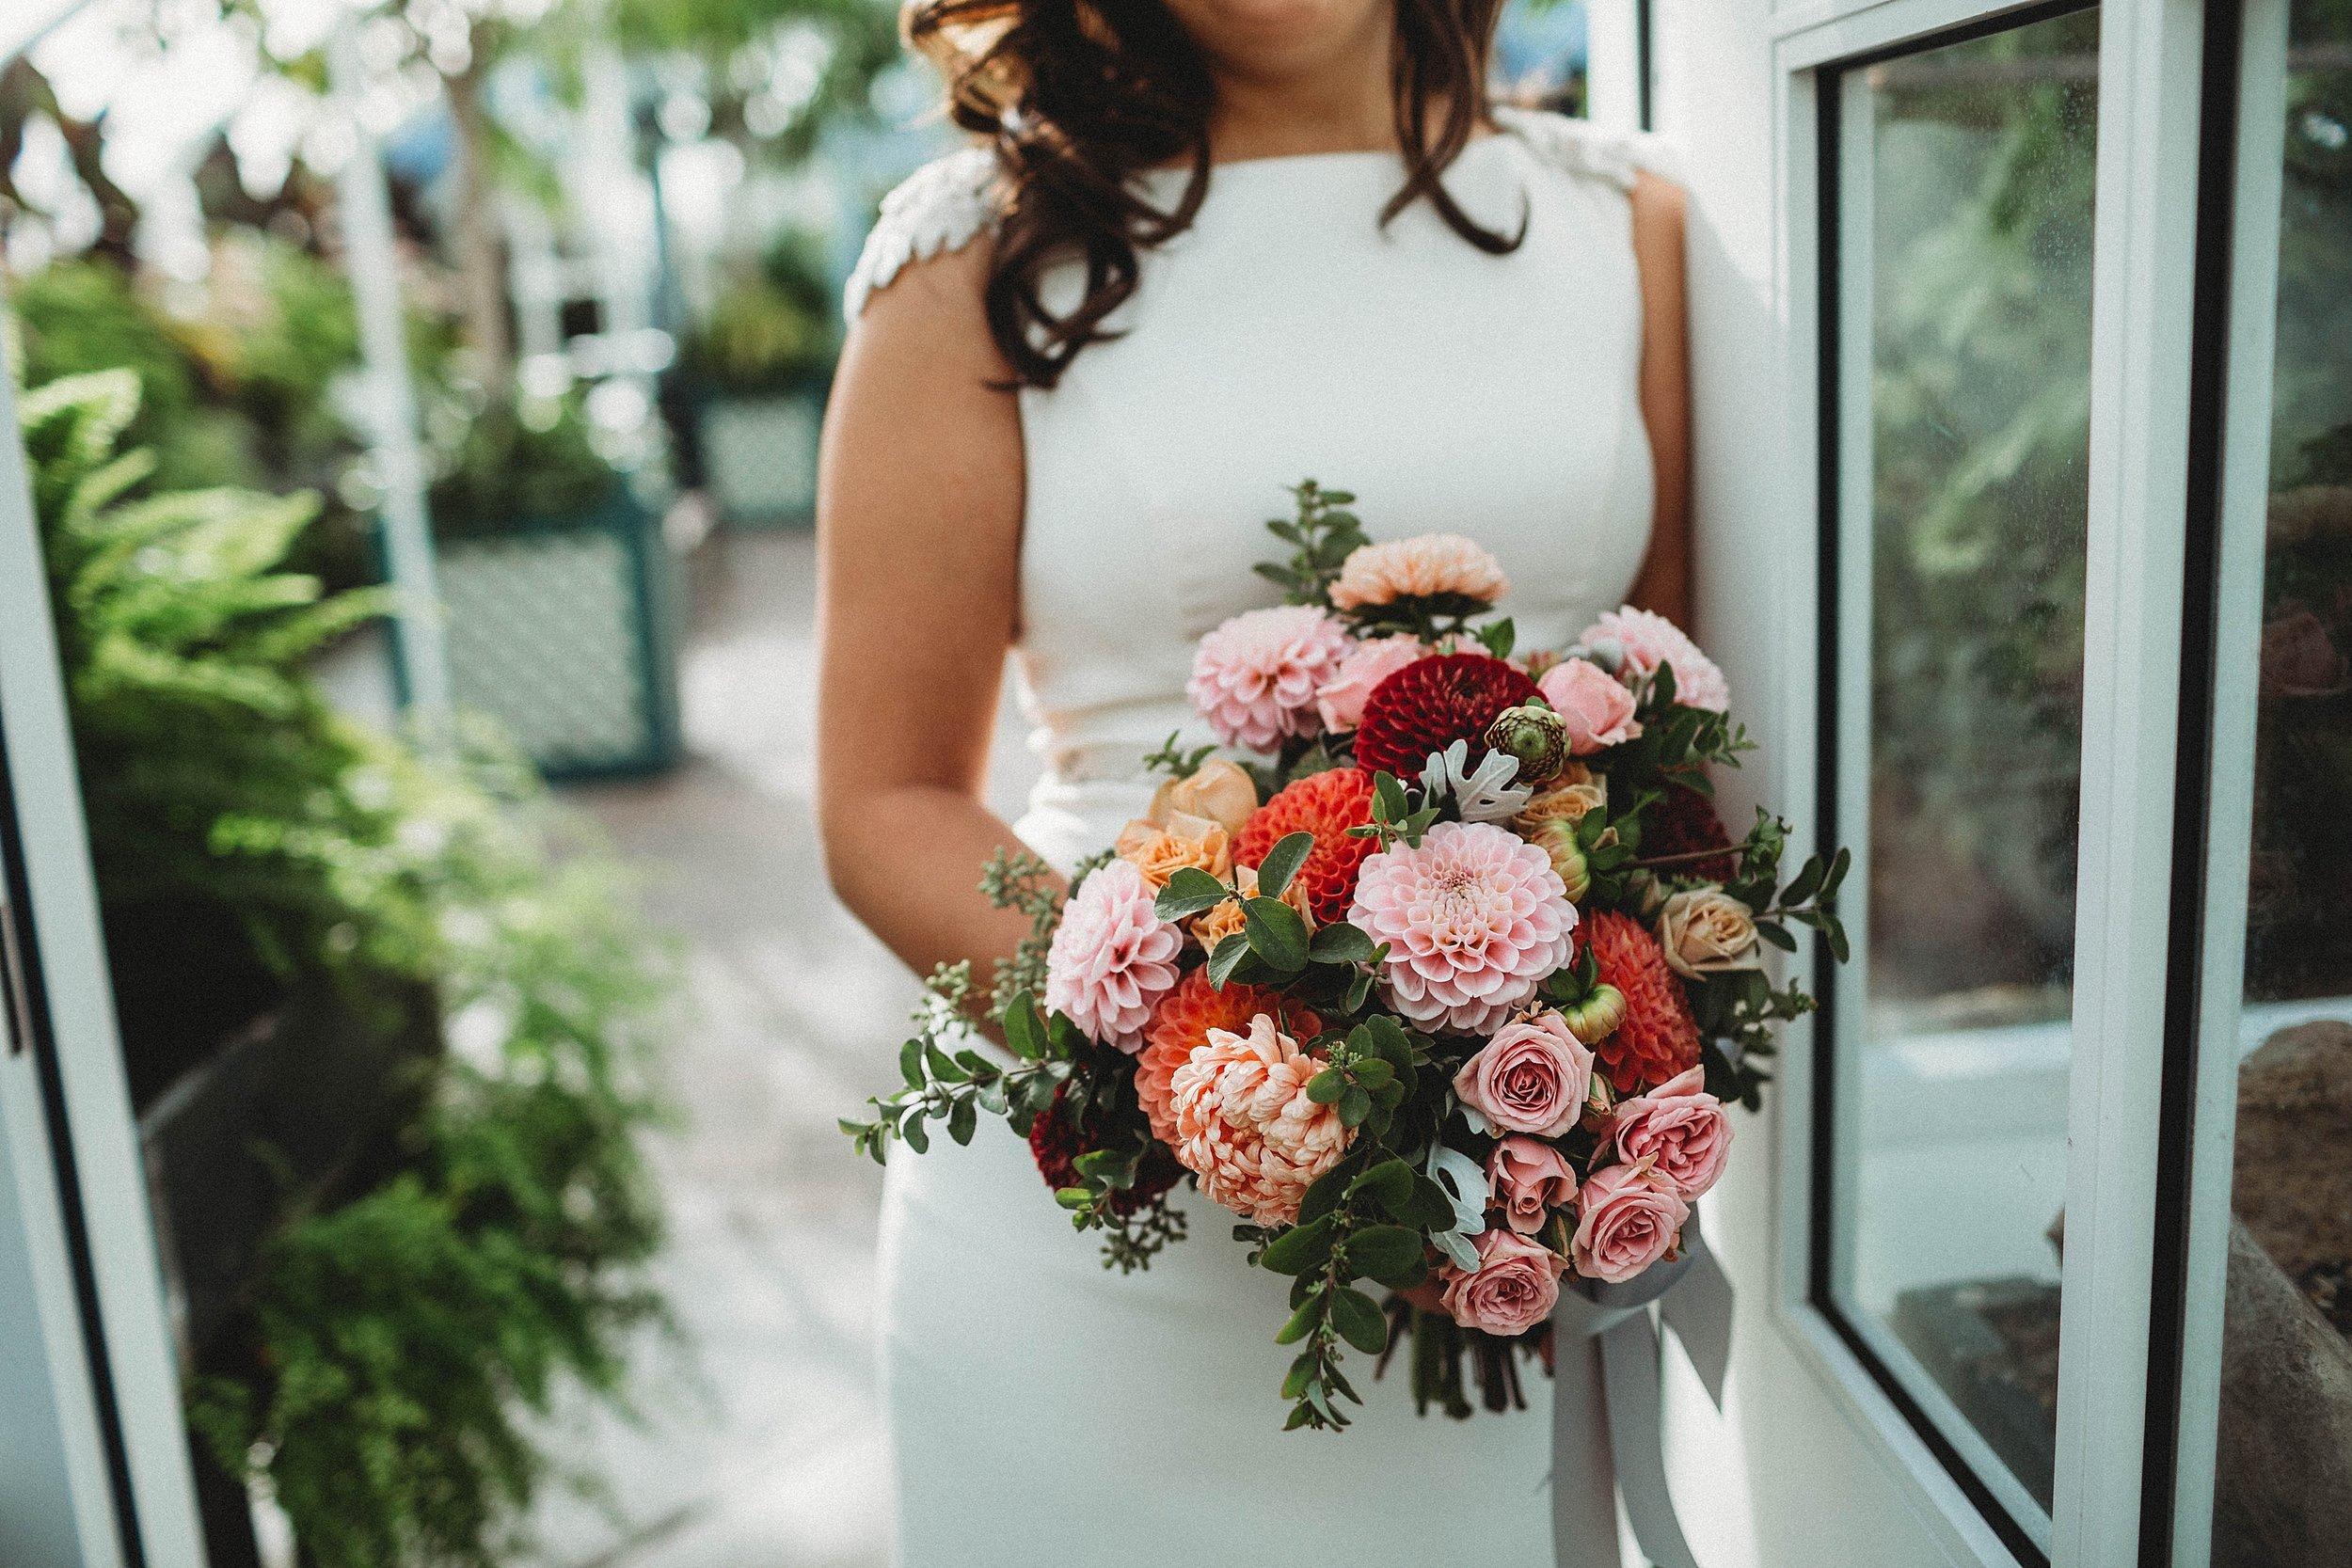 yinshi david - seattle wedding photographer - SAM wedding volunteer park reception -23.jpg